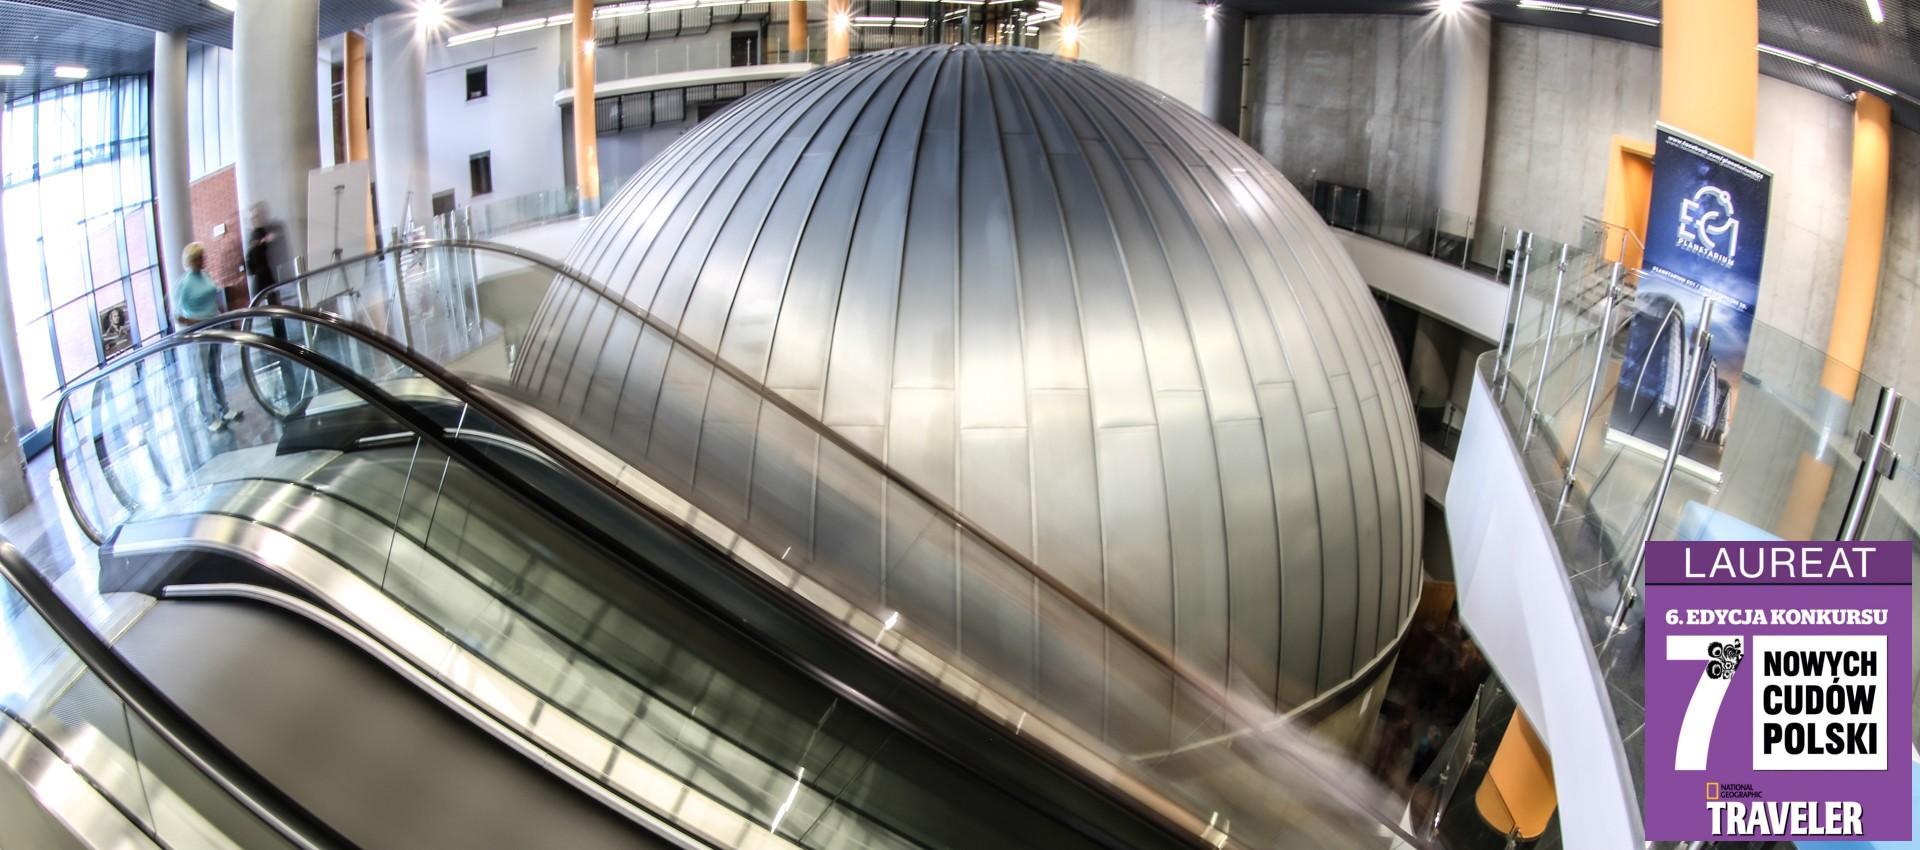 Planetarium EC1 otwarte!